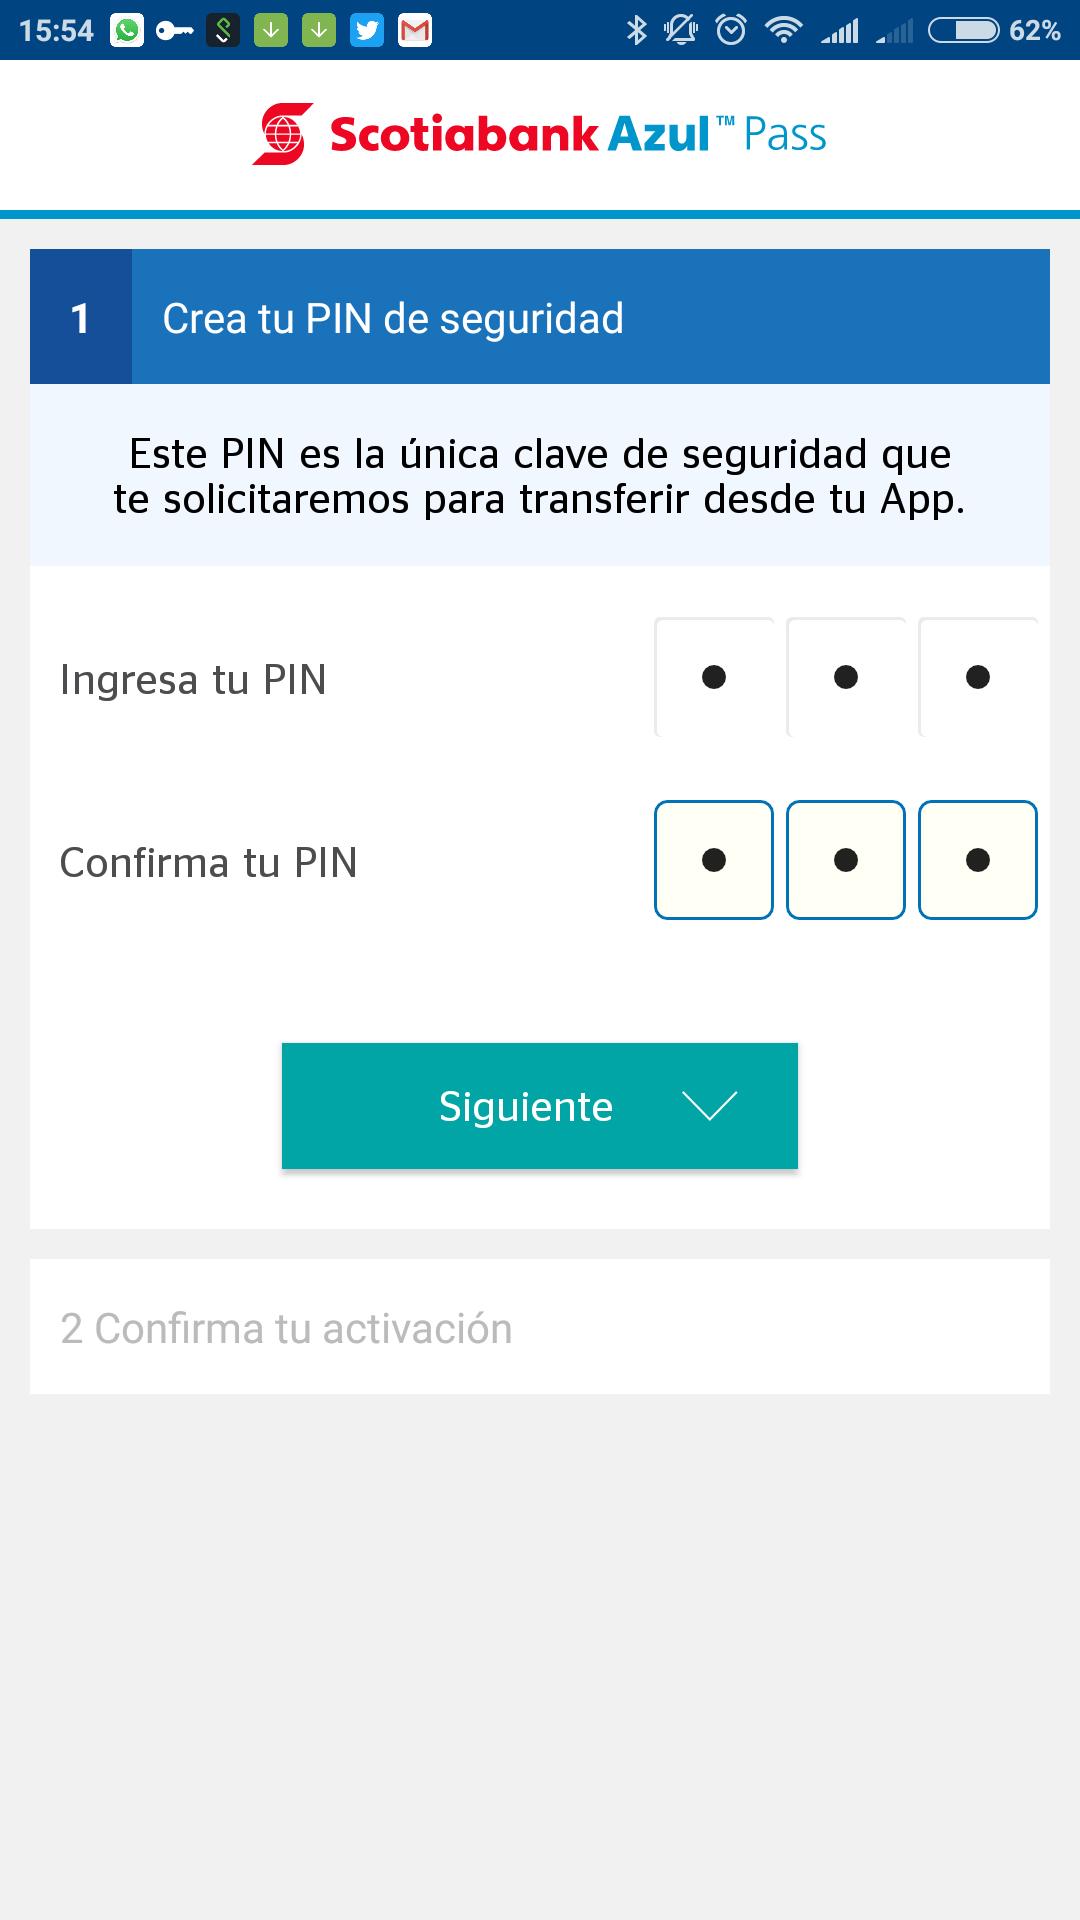 Scotiabank Azul Mobile | Scotiabank Azul